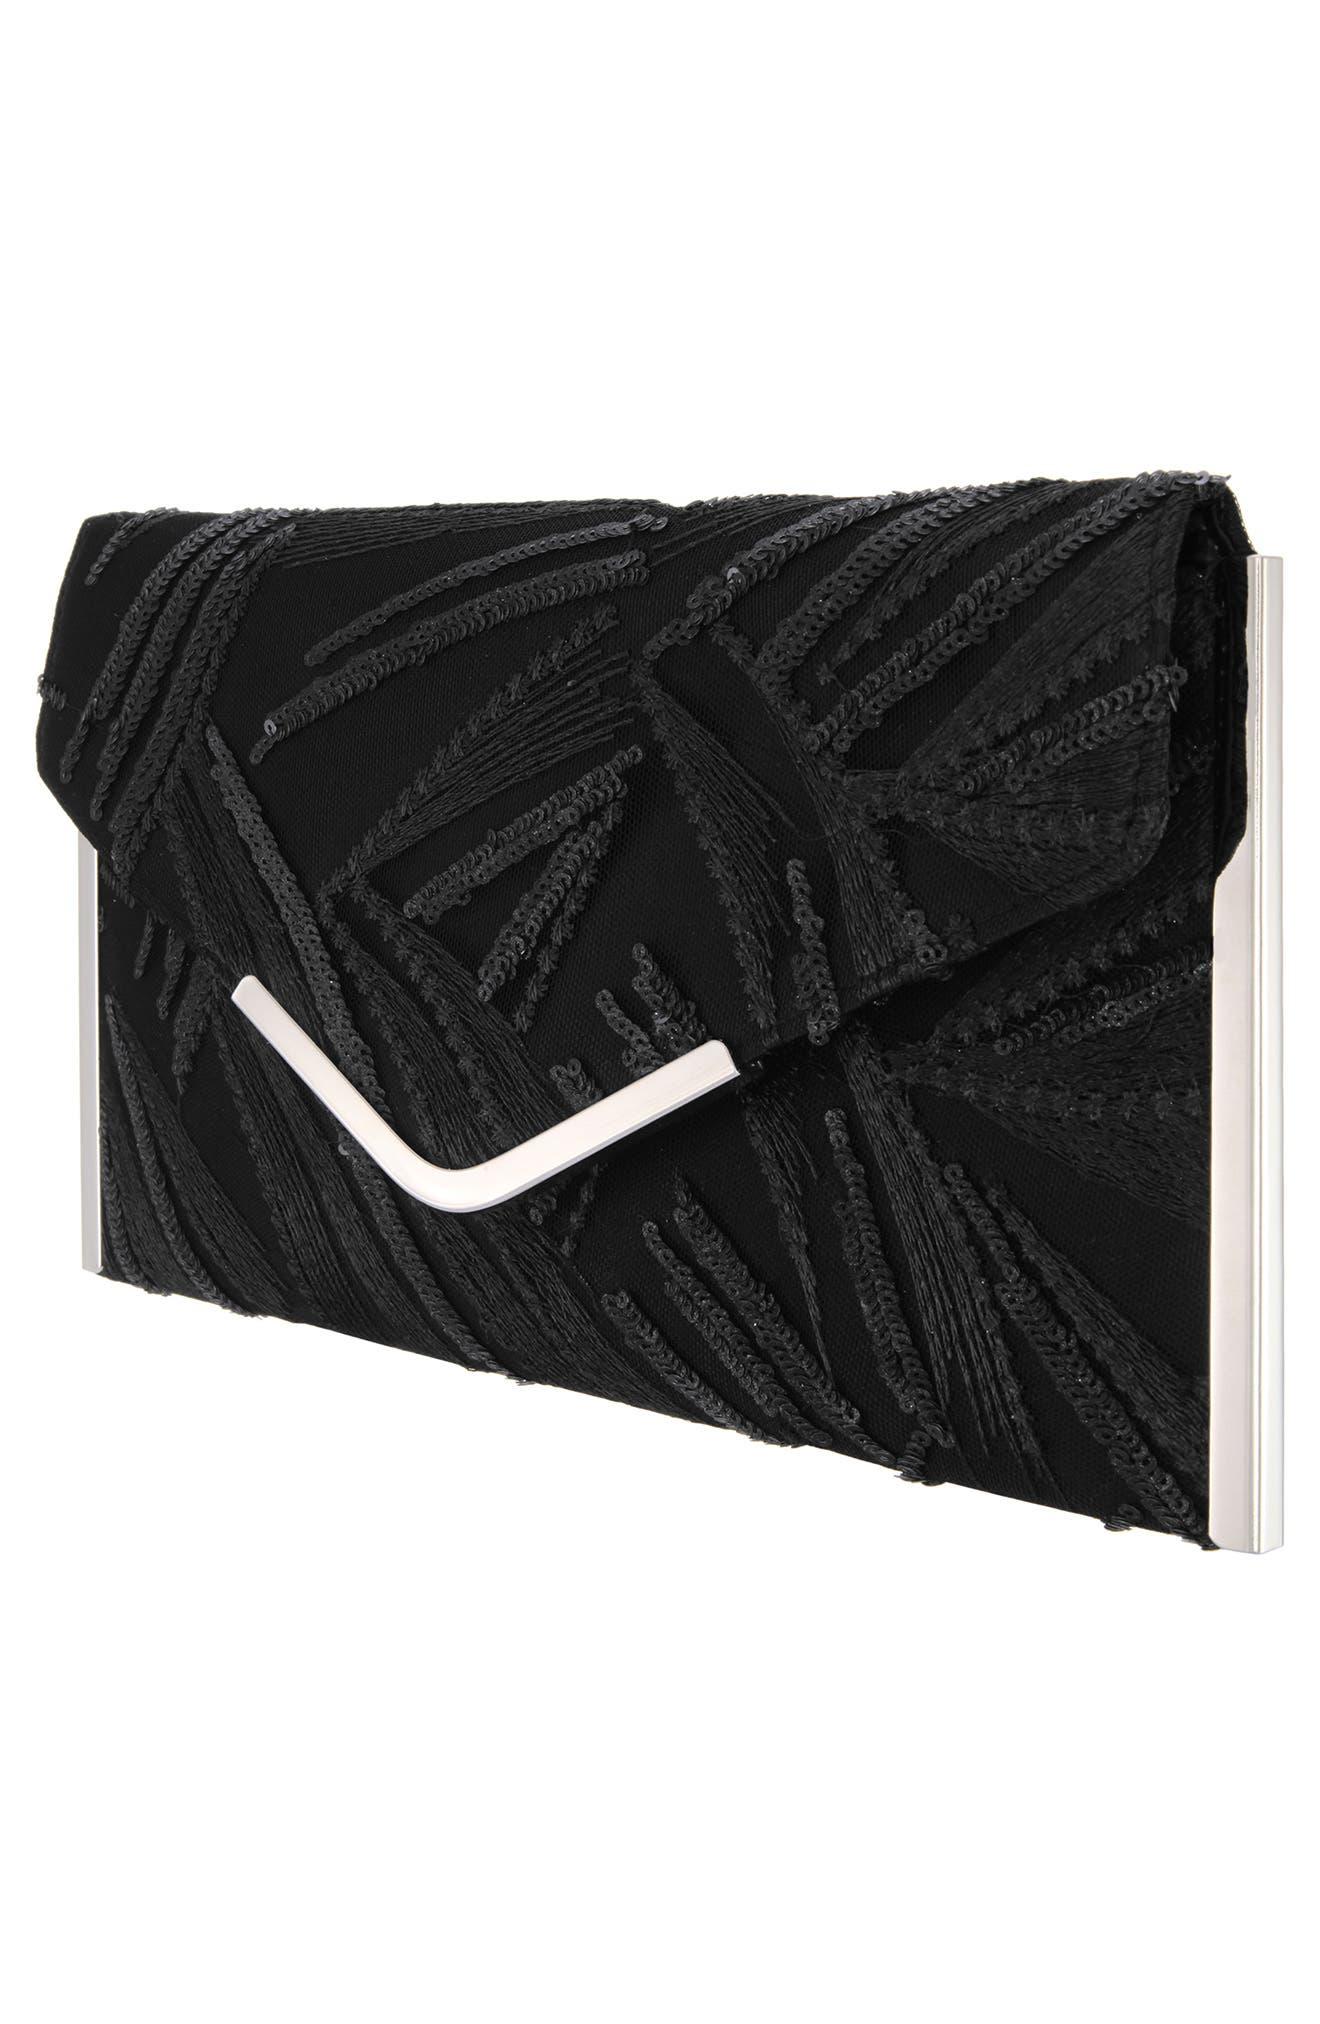 Embroidery Envelope Clutch Bag,                             Alternate thumbnail 4, color,                             BLACK